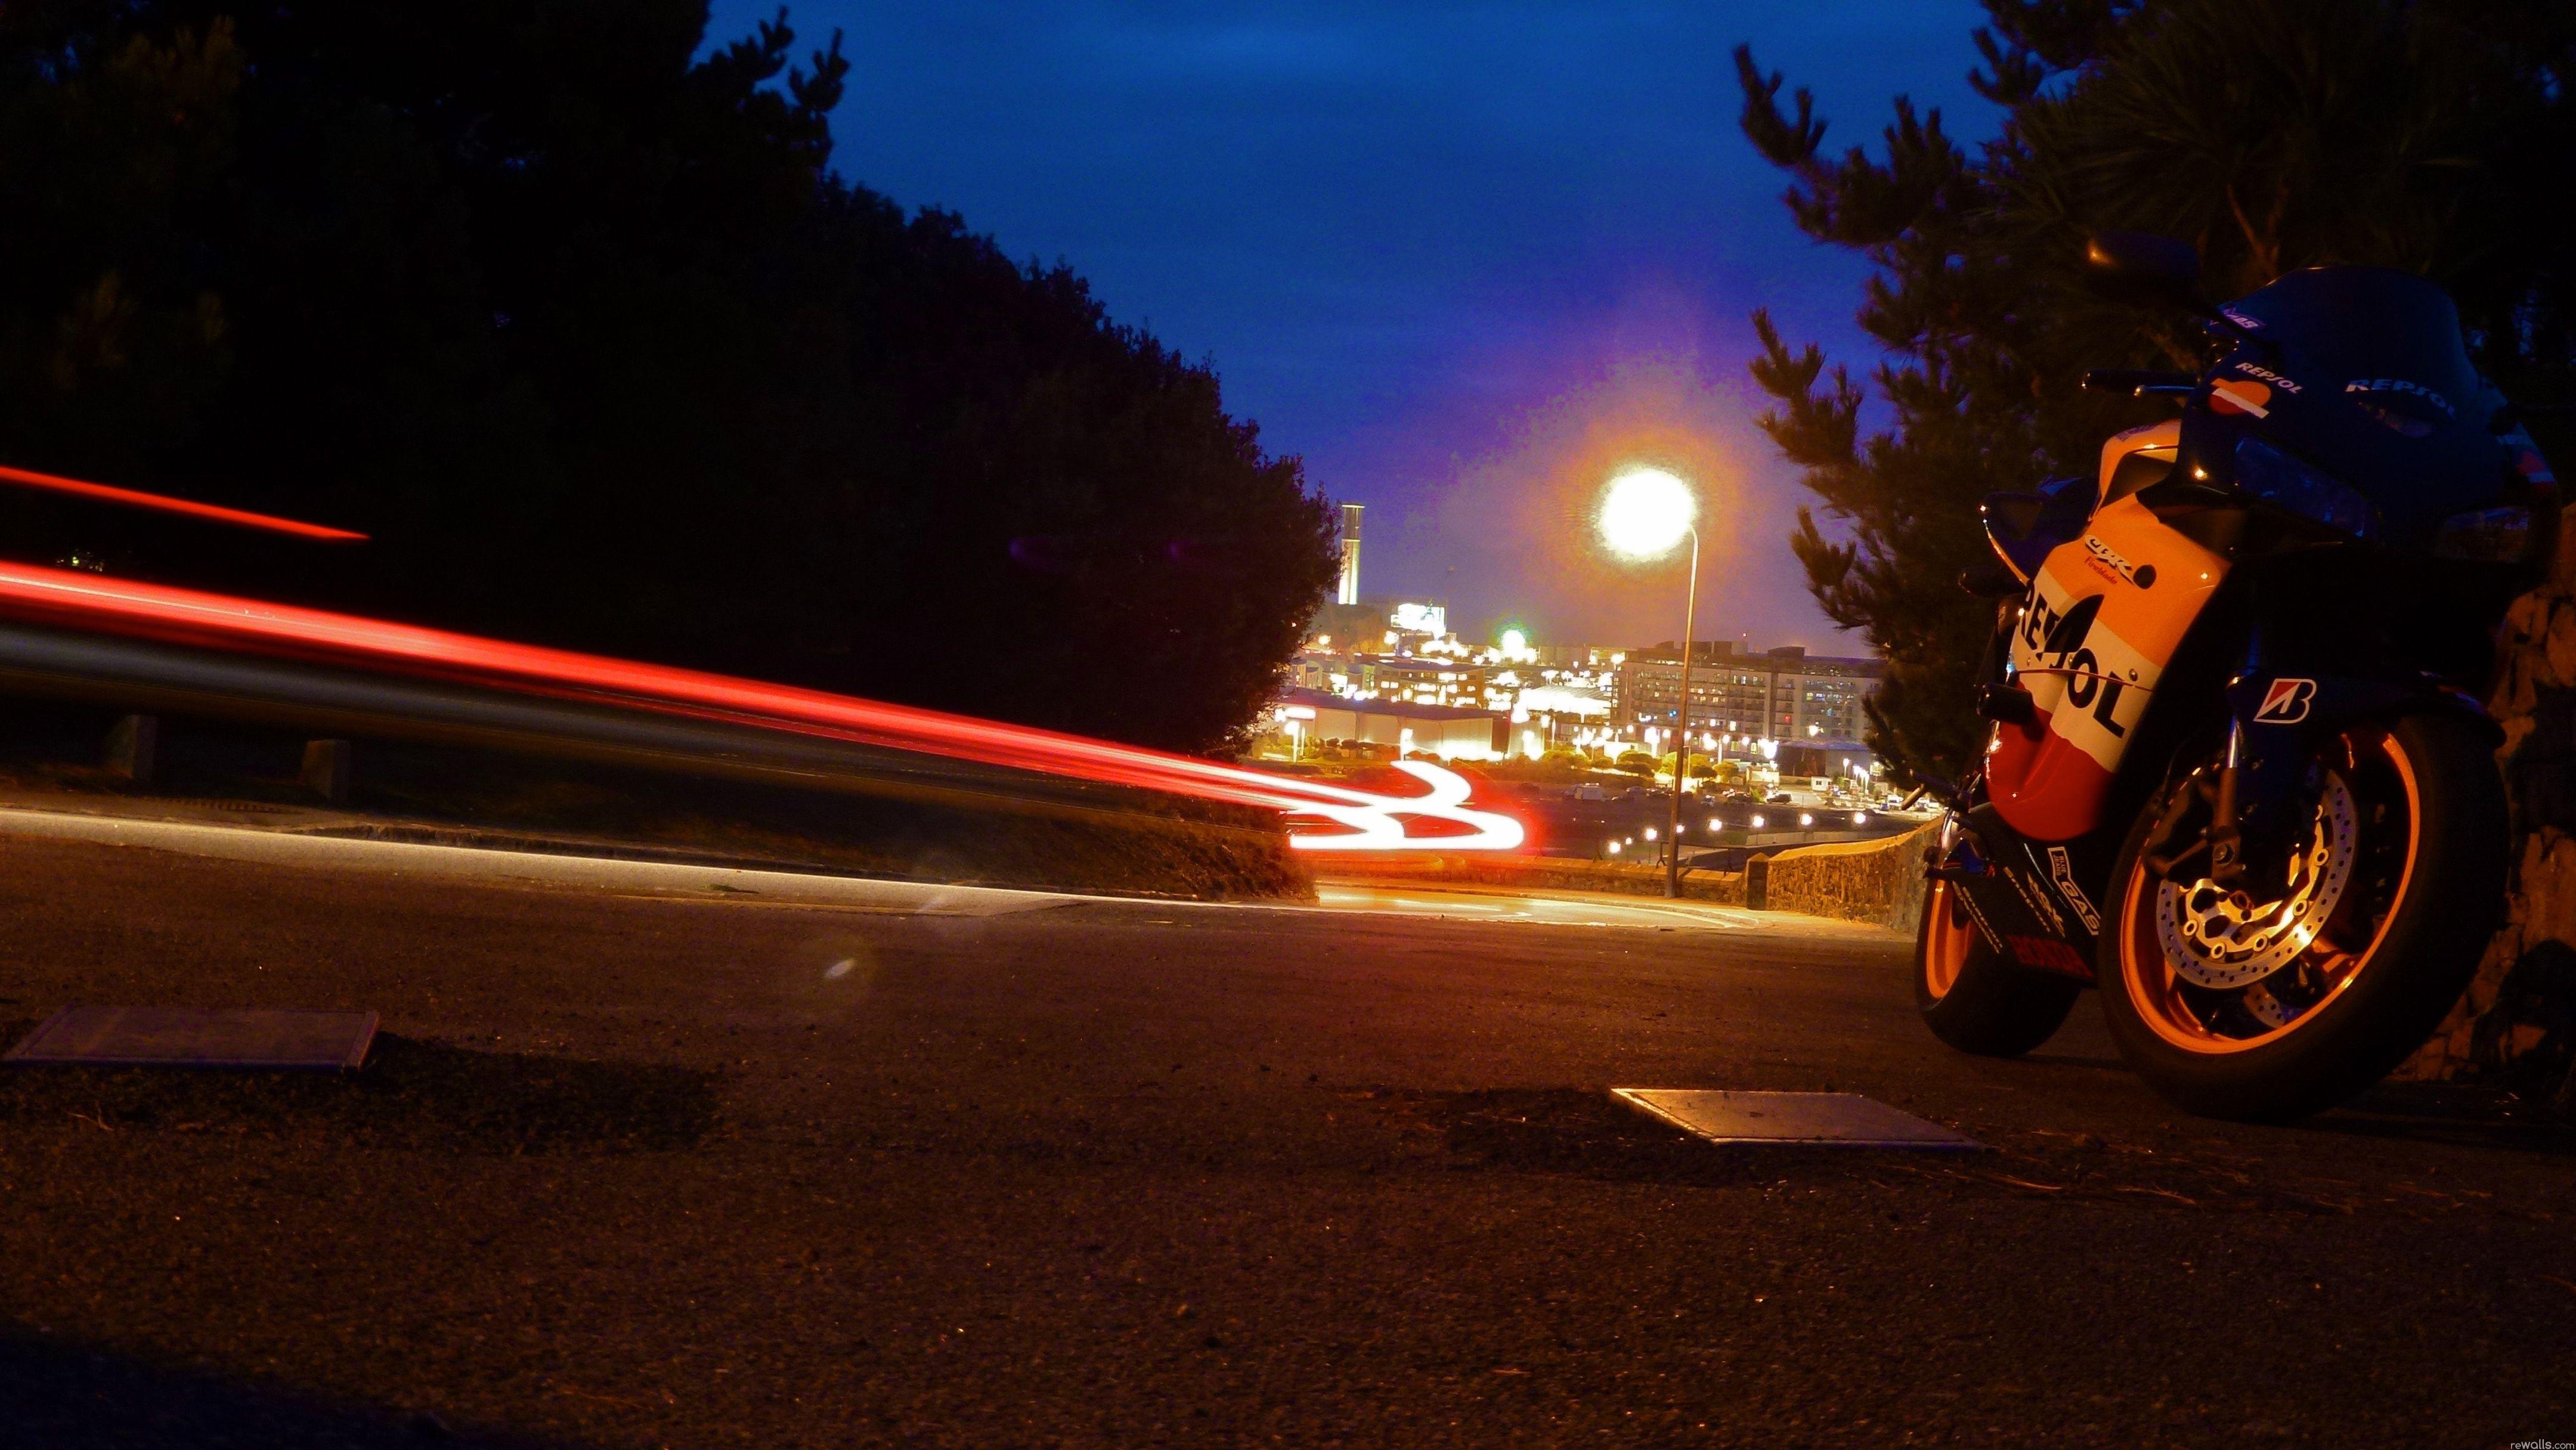 Honda CBR Repsol Wallpapers   Top Honda CBR Repsol 4320x2432